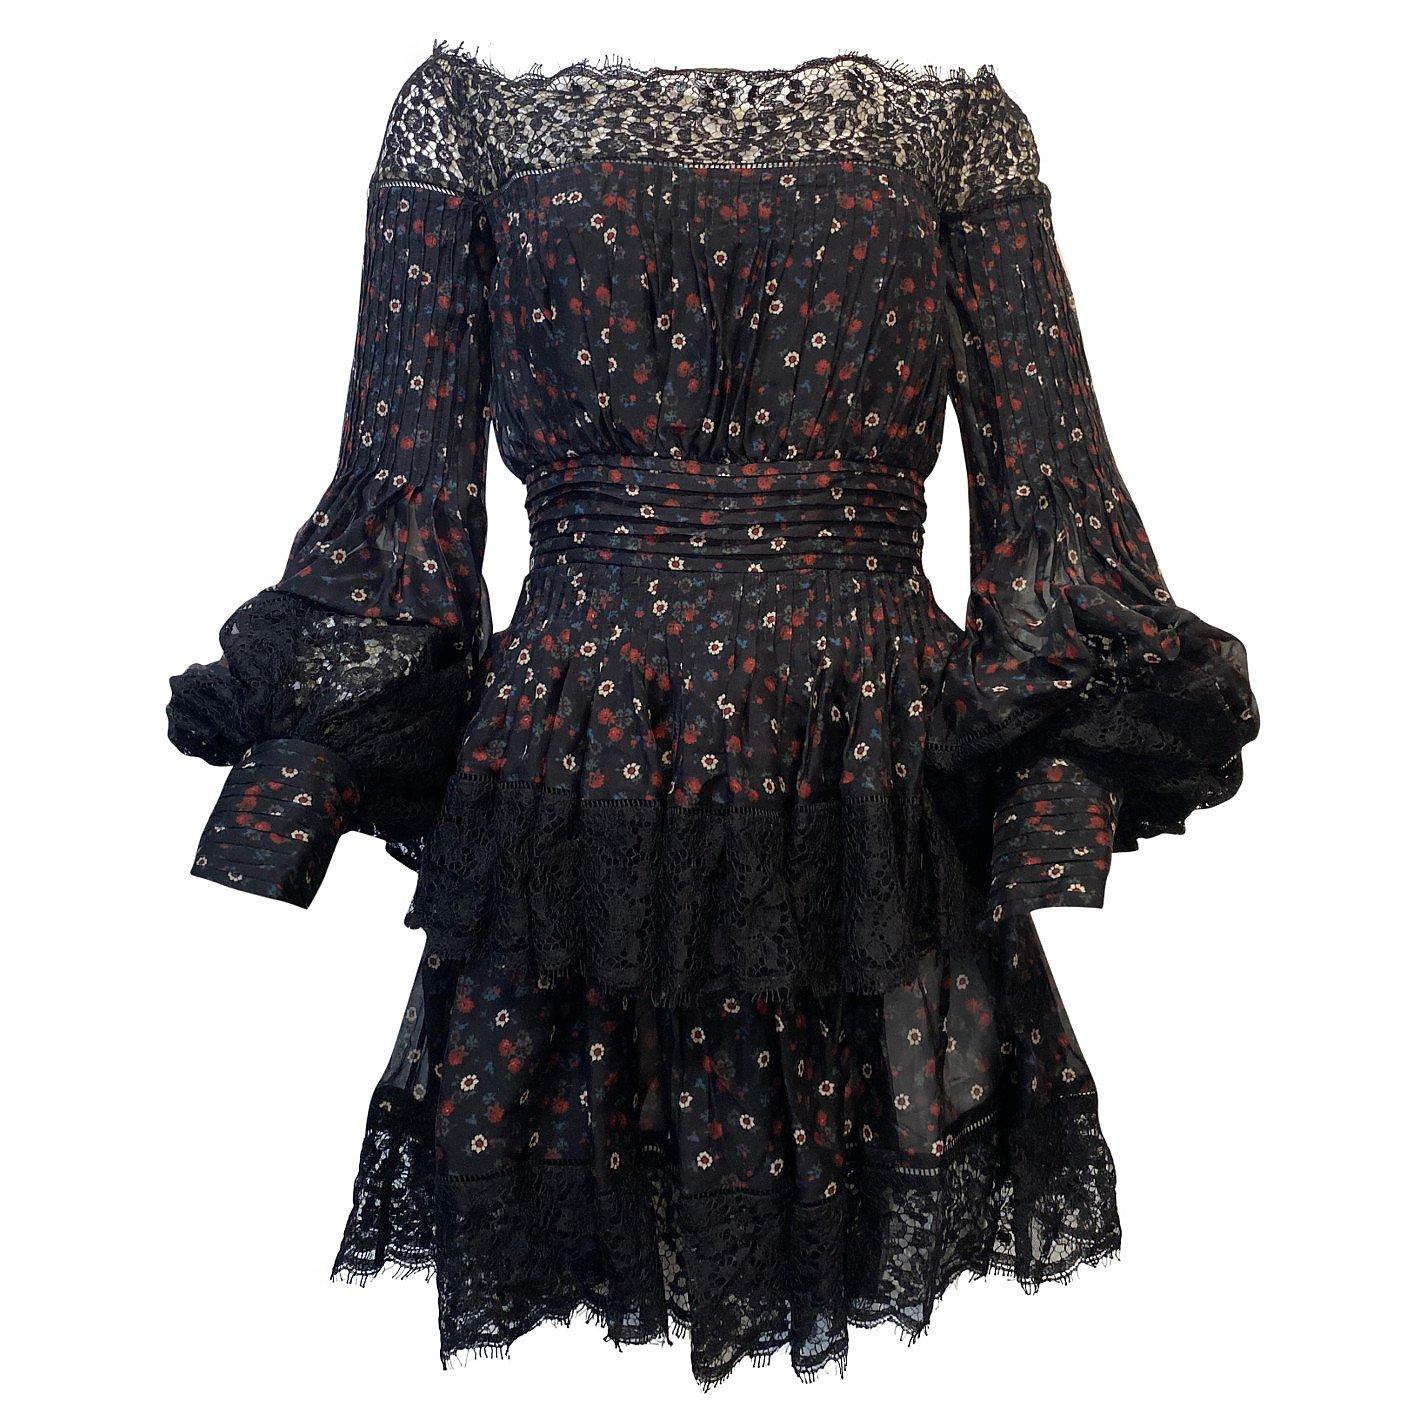 Alexander McQueen Lace-Trimmed Floral Off-The-Shoulder Dress